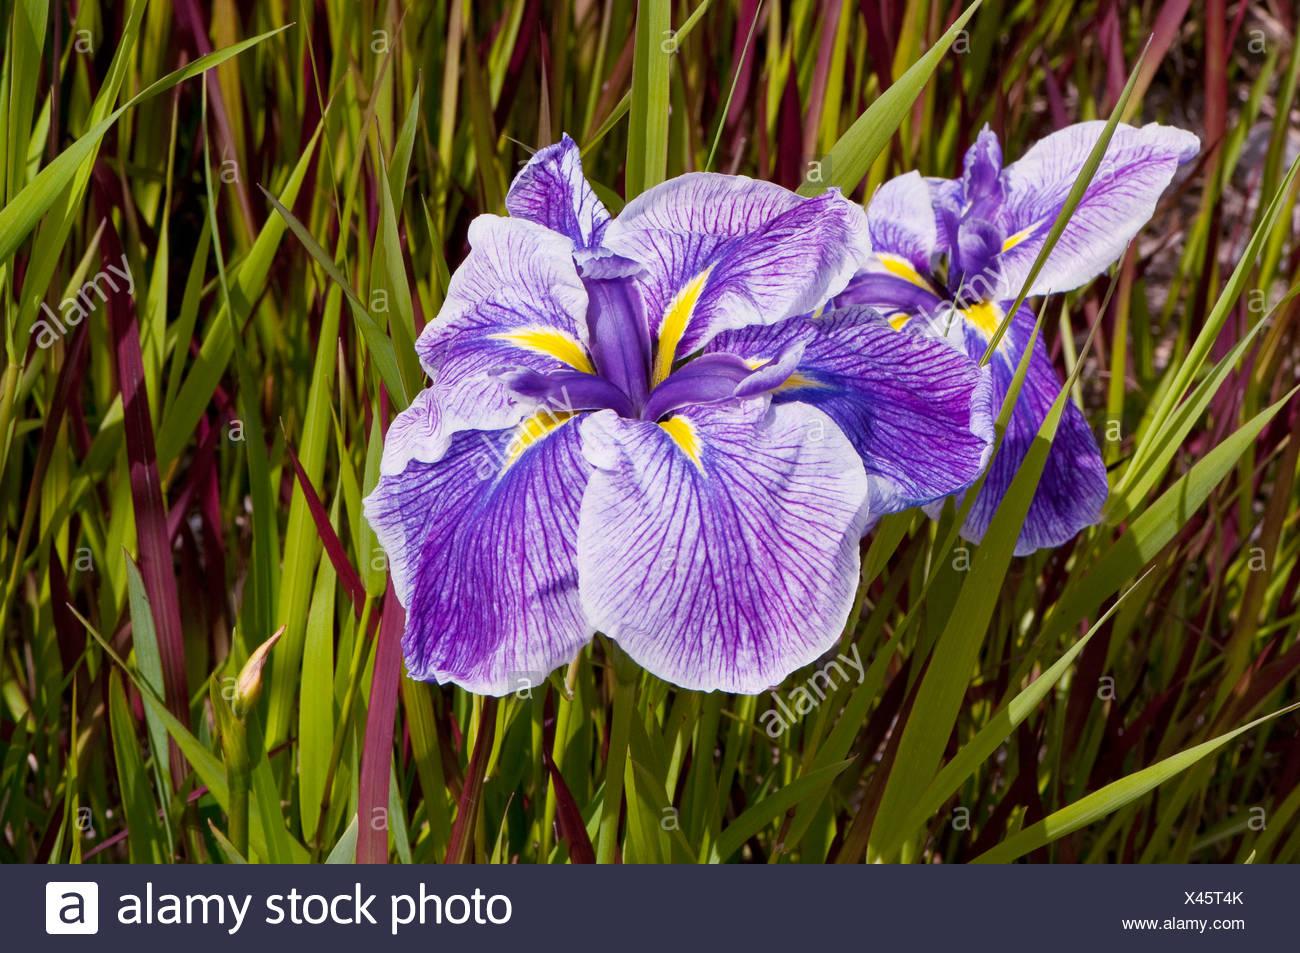 Bulbous Iris - Stock Image